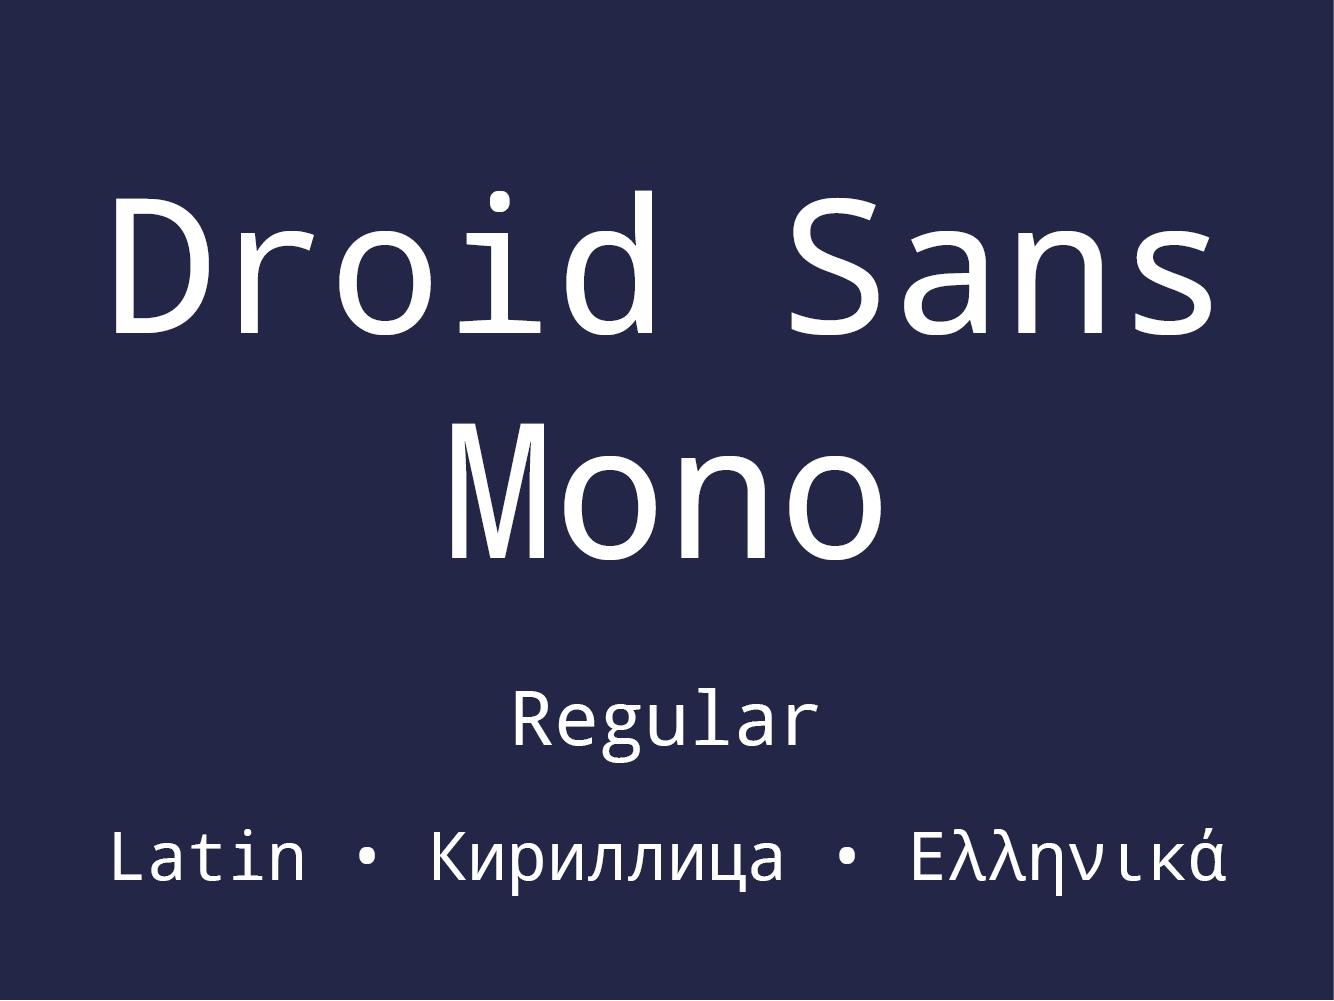 Droid Sans Mono